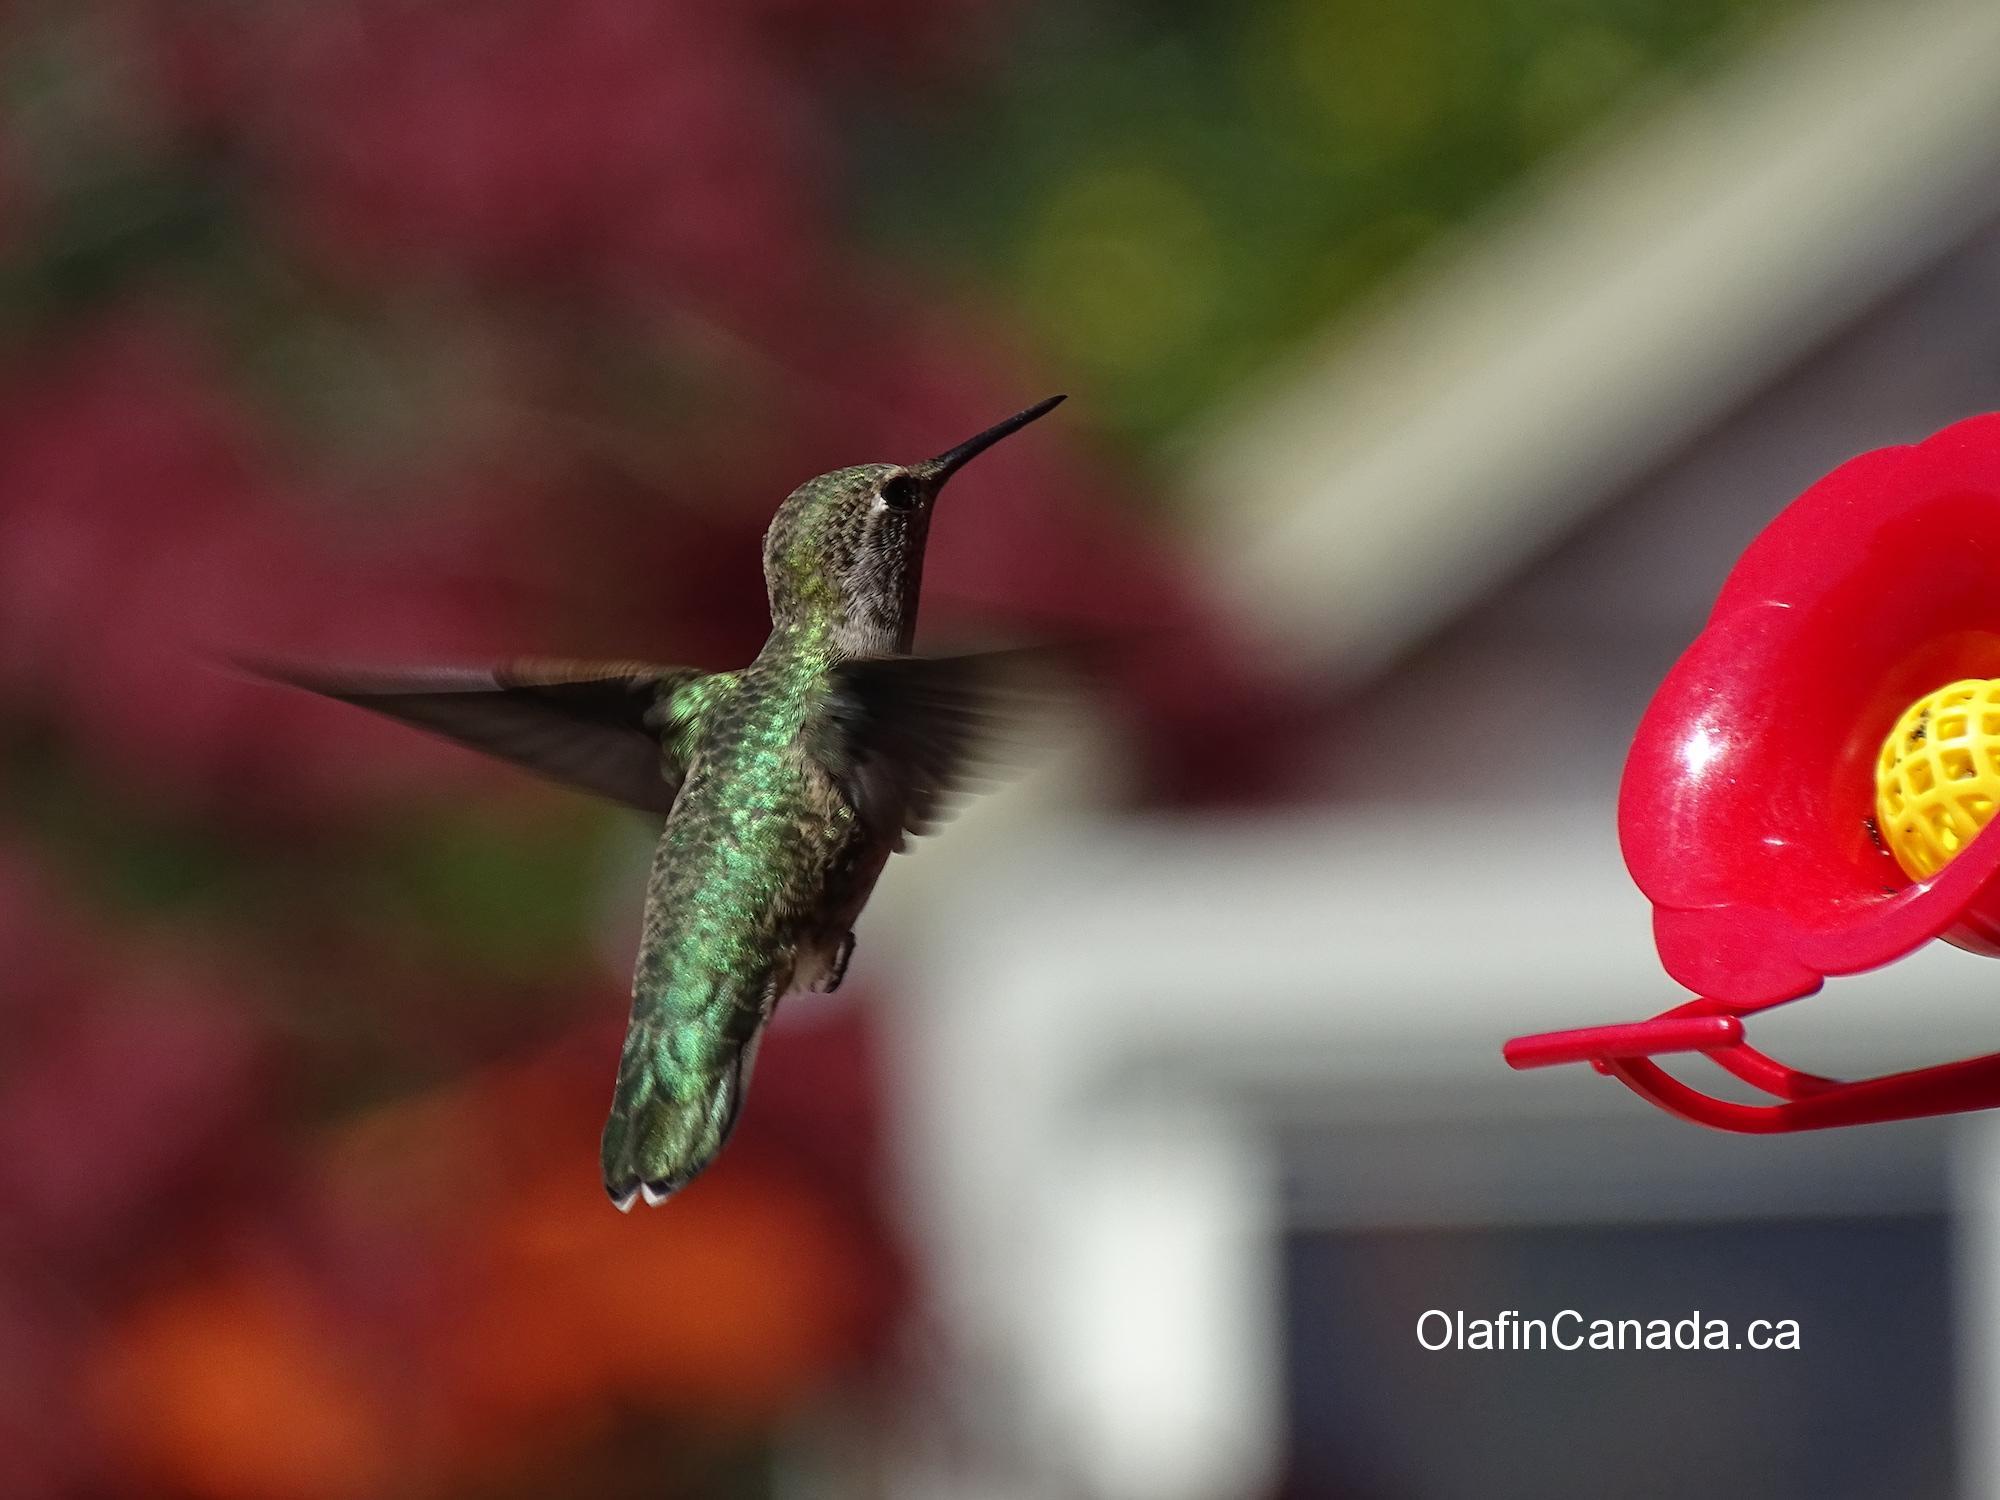 Hummingbird hanging in the air #olafincanada #britishcolumbia #discoverbc #wildlife #hummingbird